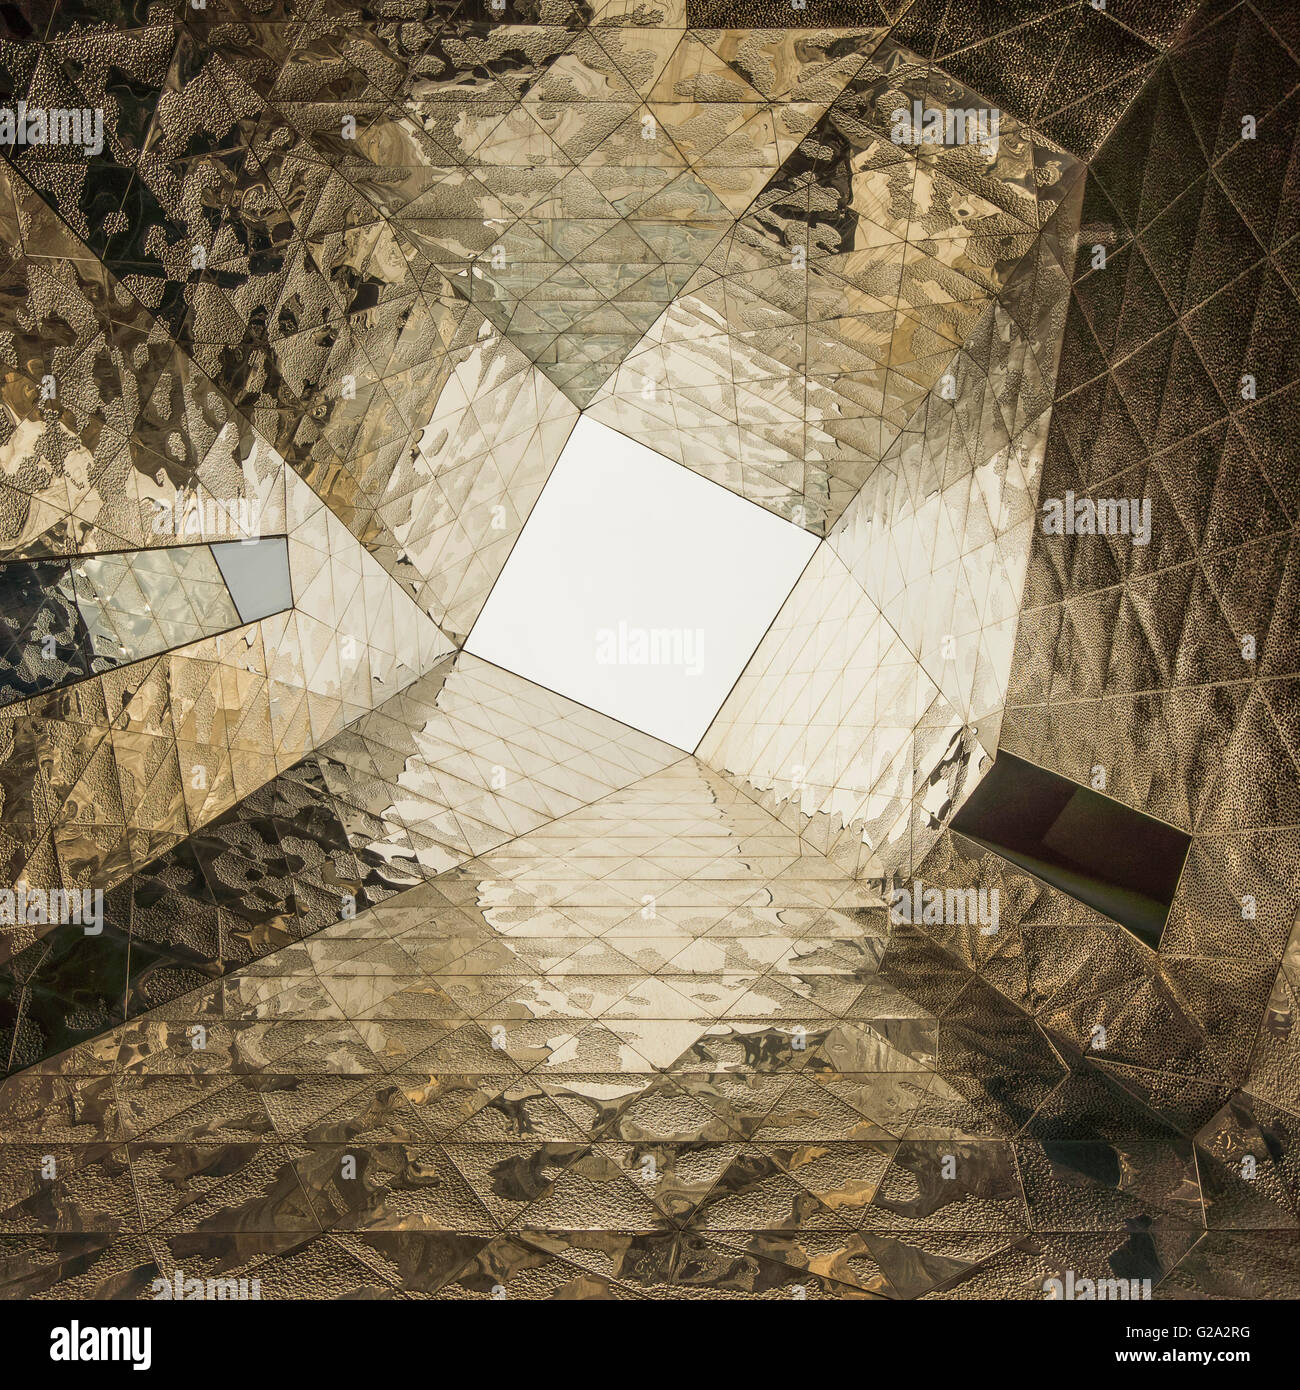 Mirror composition at Forum Building by Jacques Herzog and Pierre de Meuron. Barcelona. Catalonia. Spain. Stock Photo